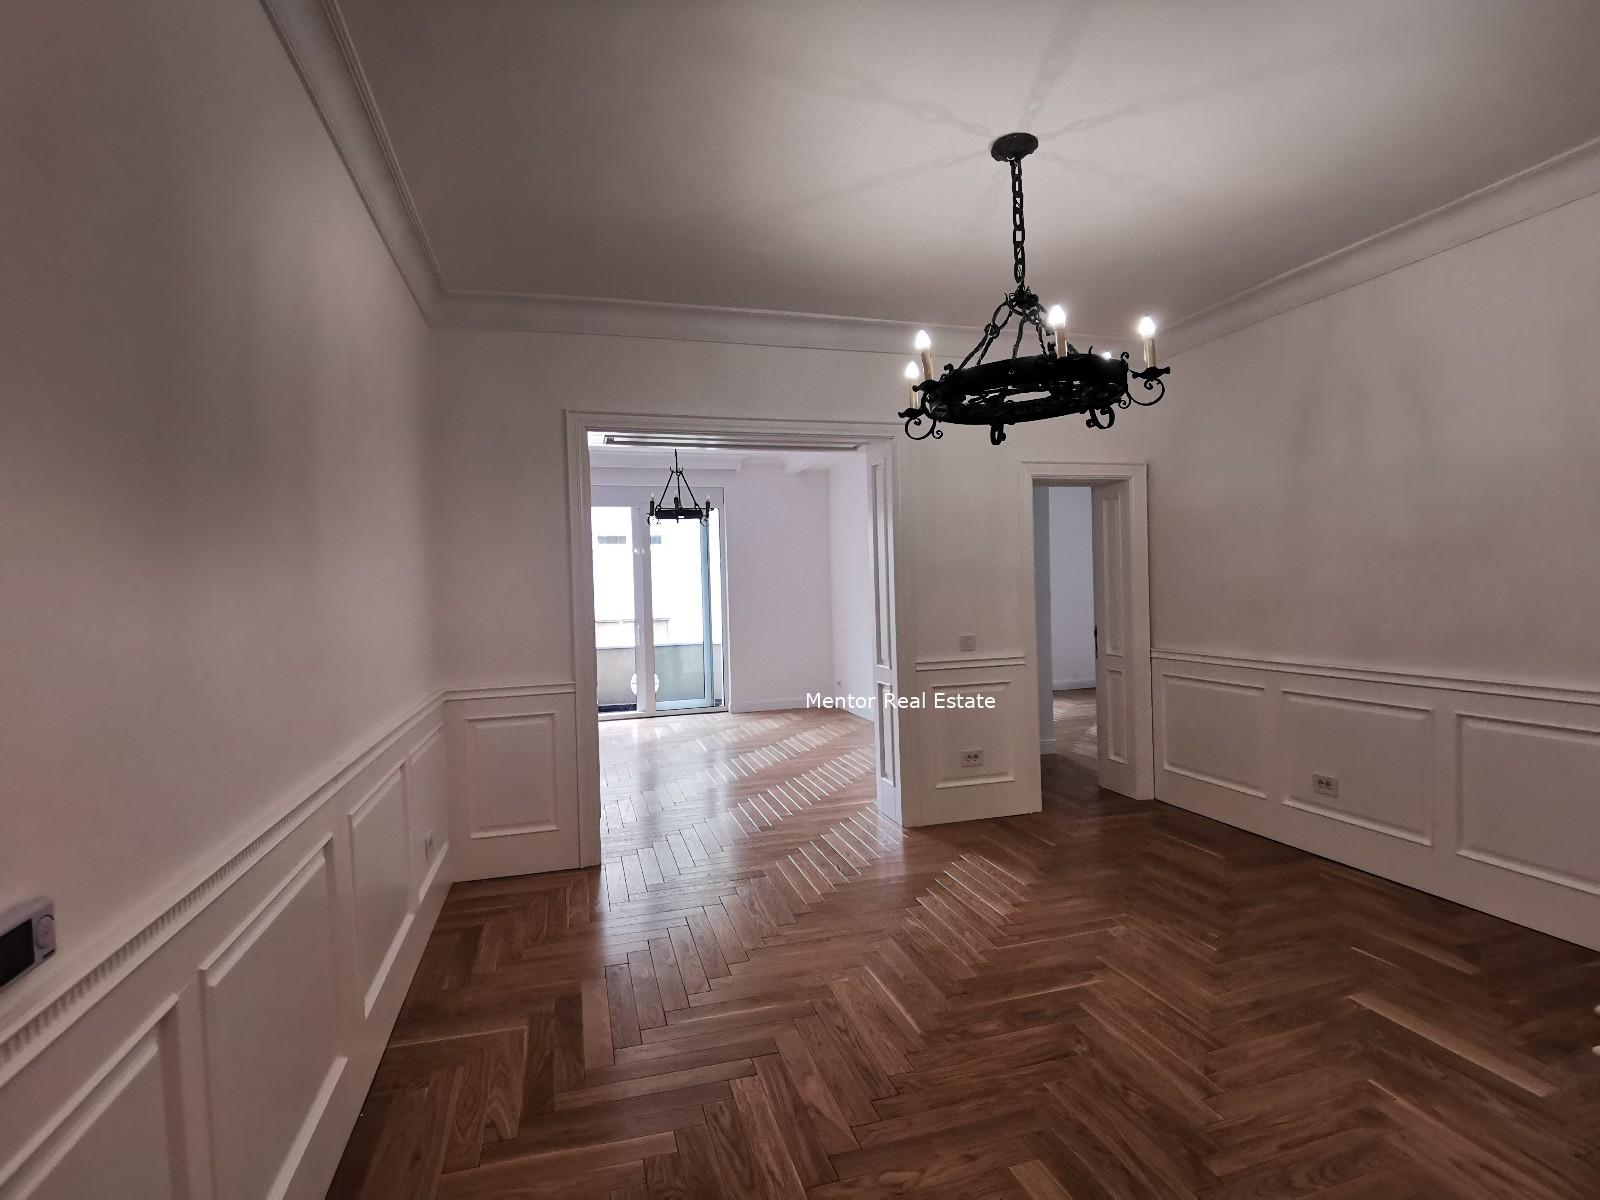 Vračar 100sqm luxury apartment for rent